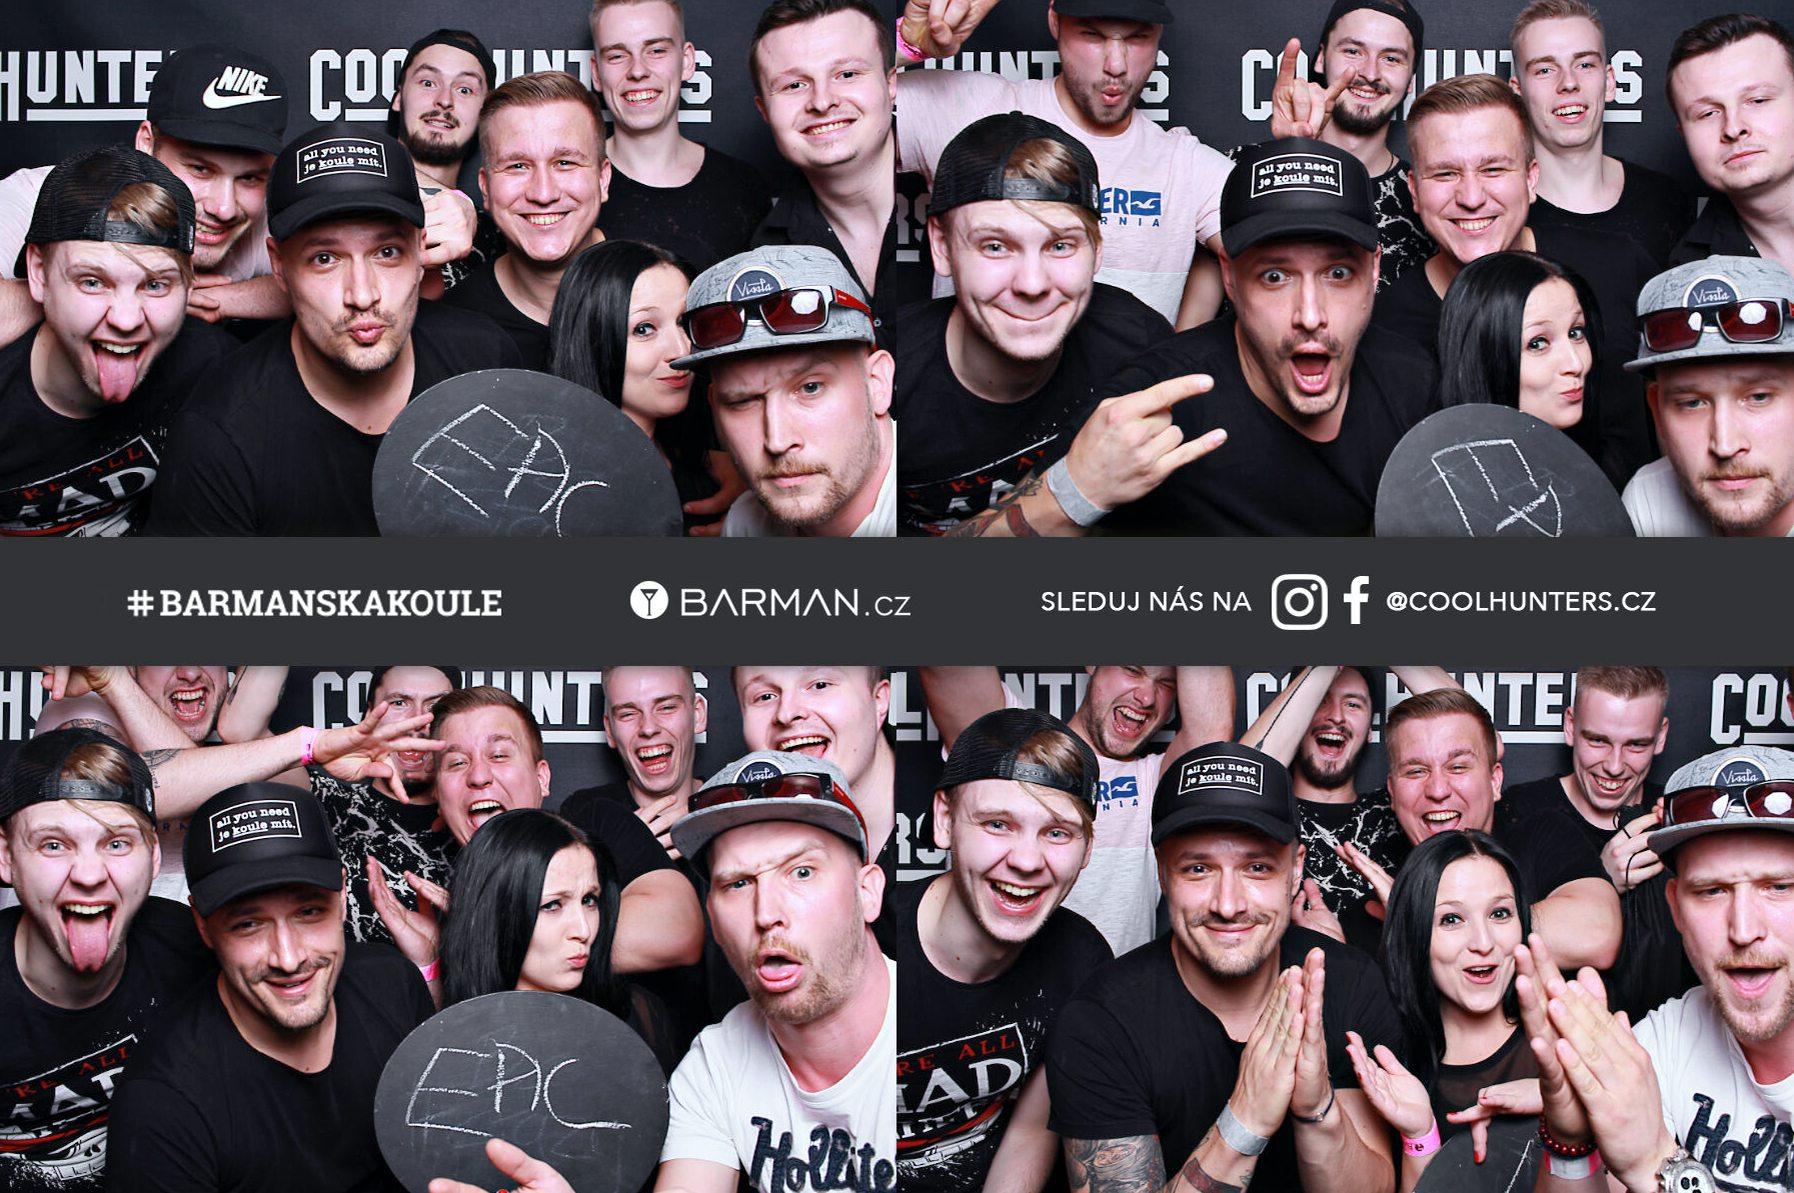 fotokoutek-coolhunters-barmanska-koule-22-4-2018-412240